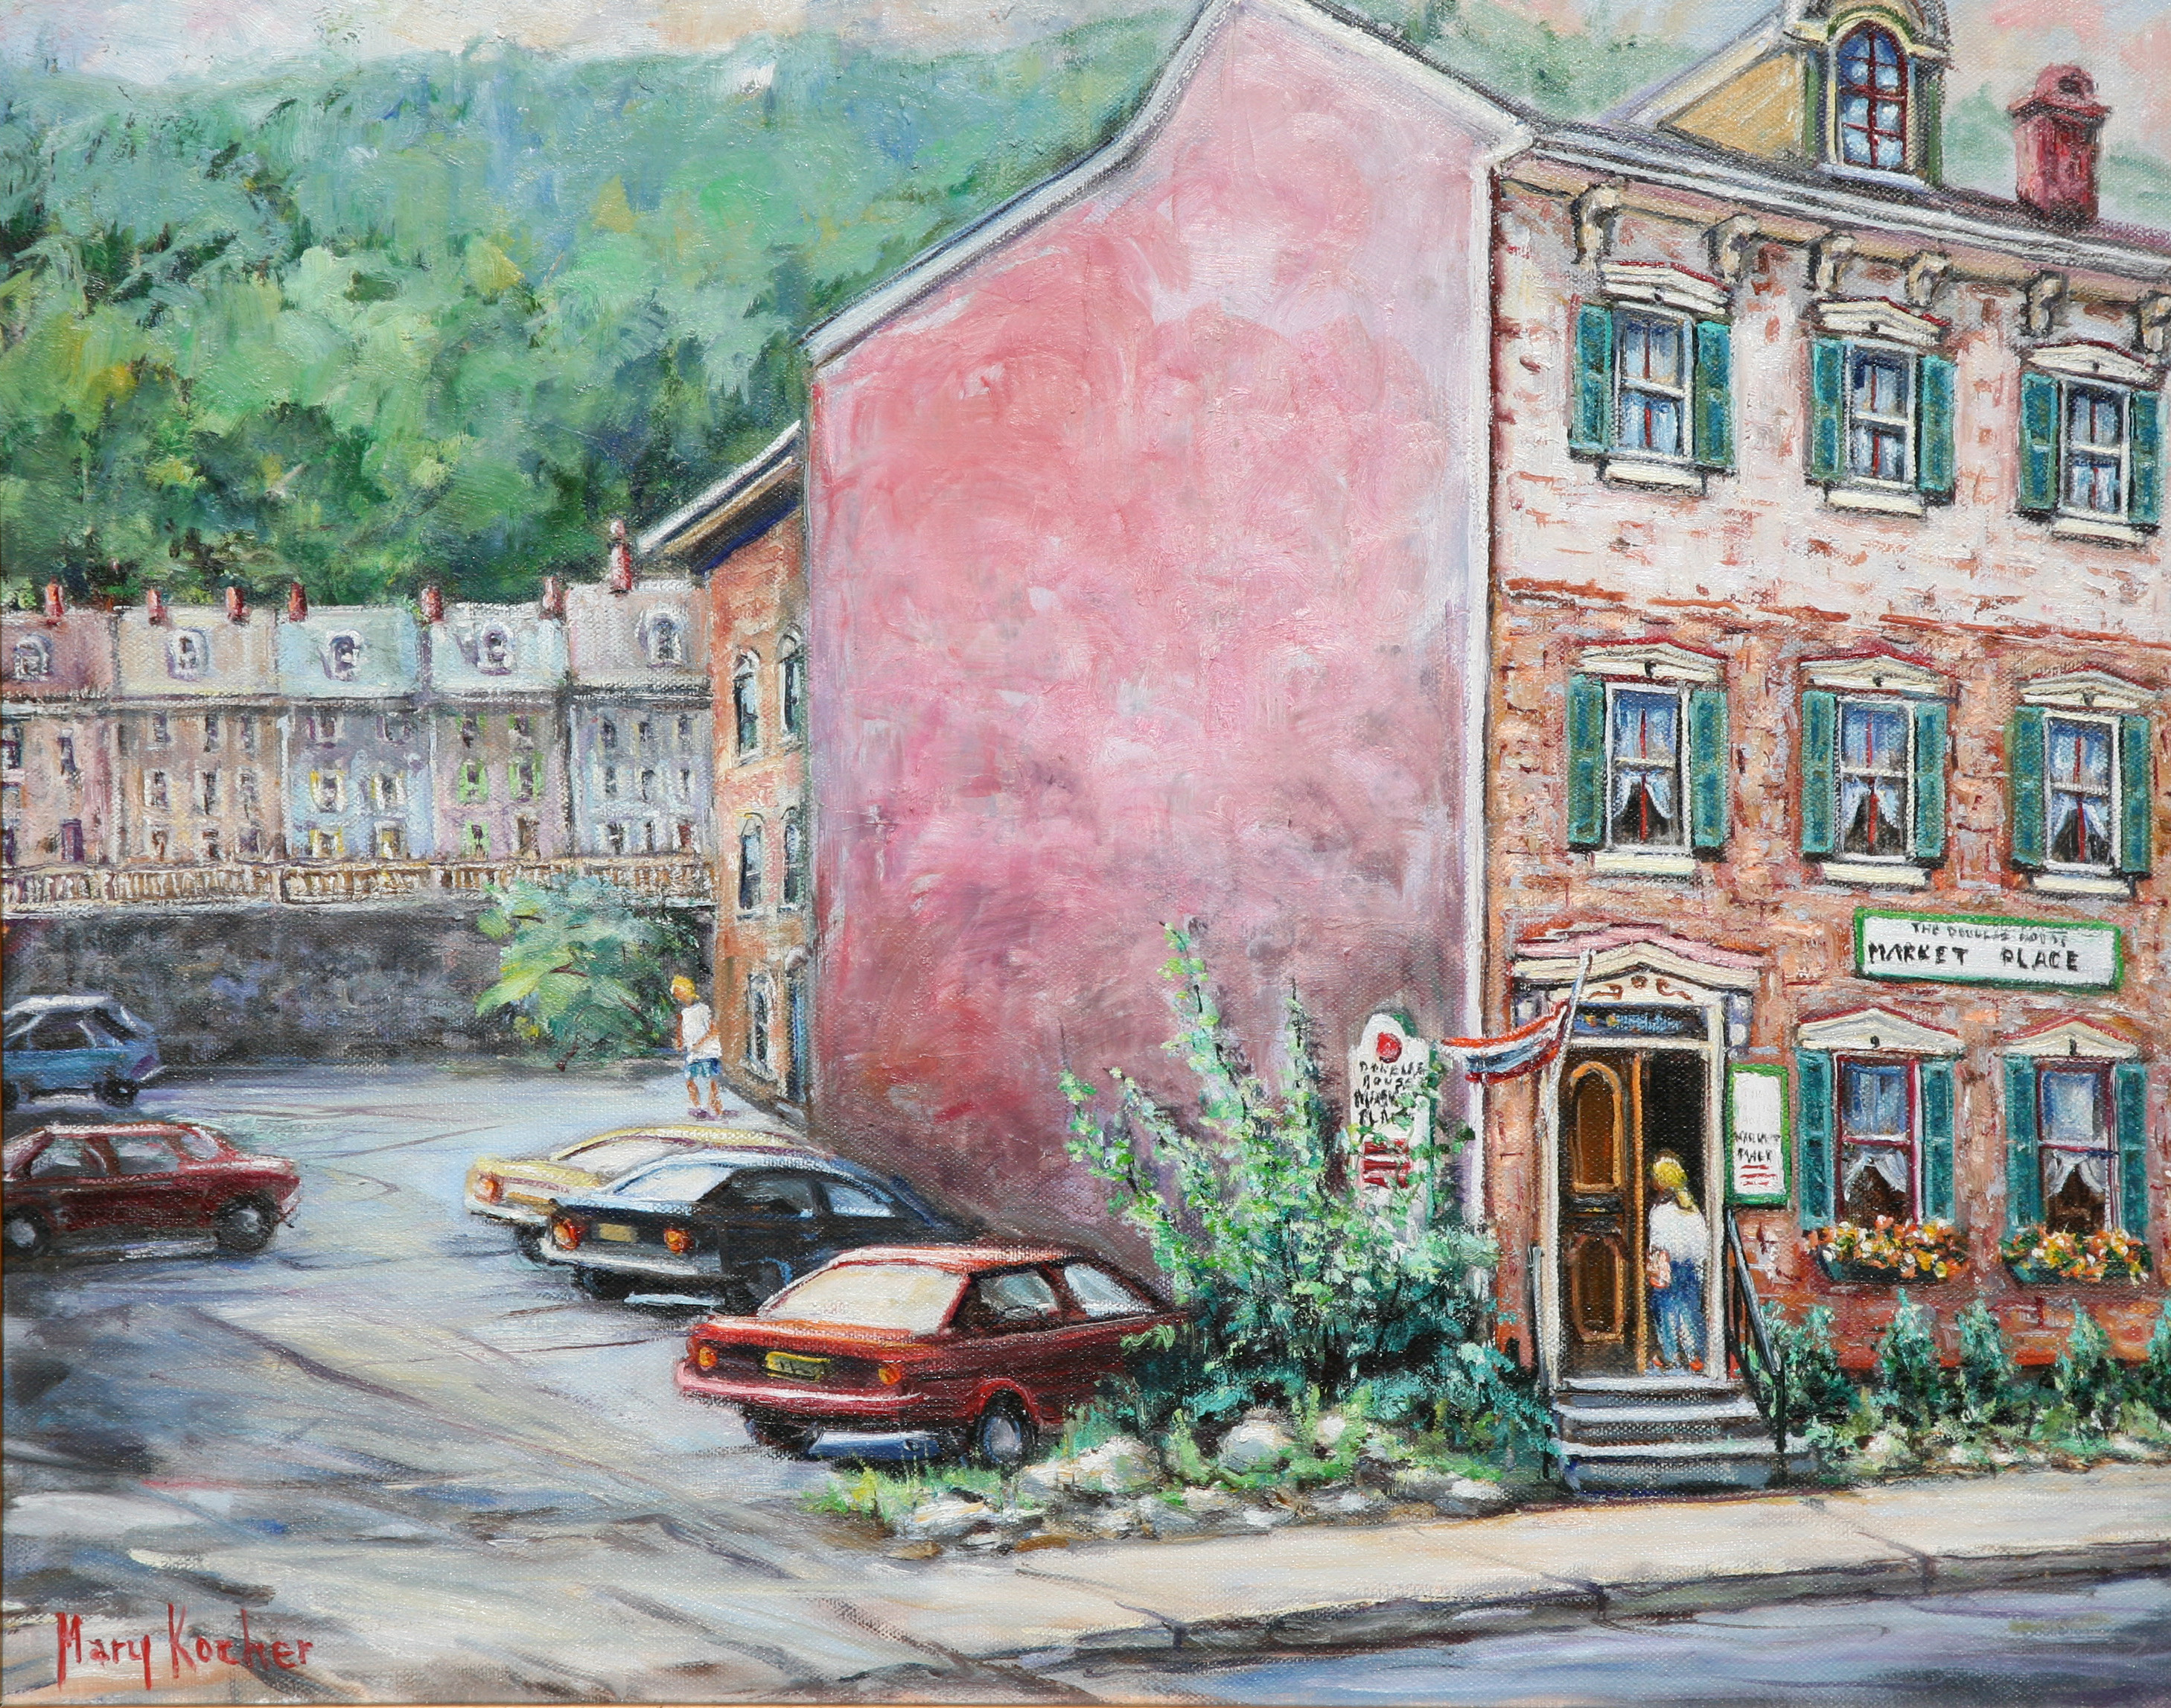 Mary Kocher - auction piece